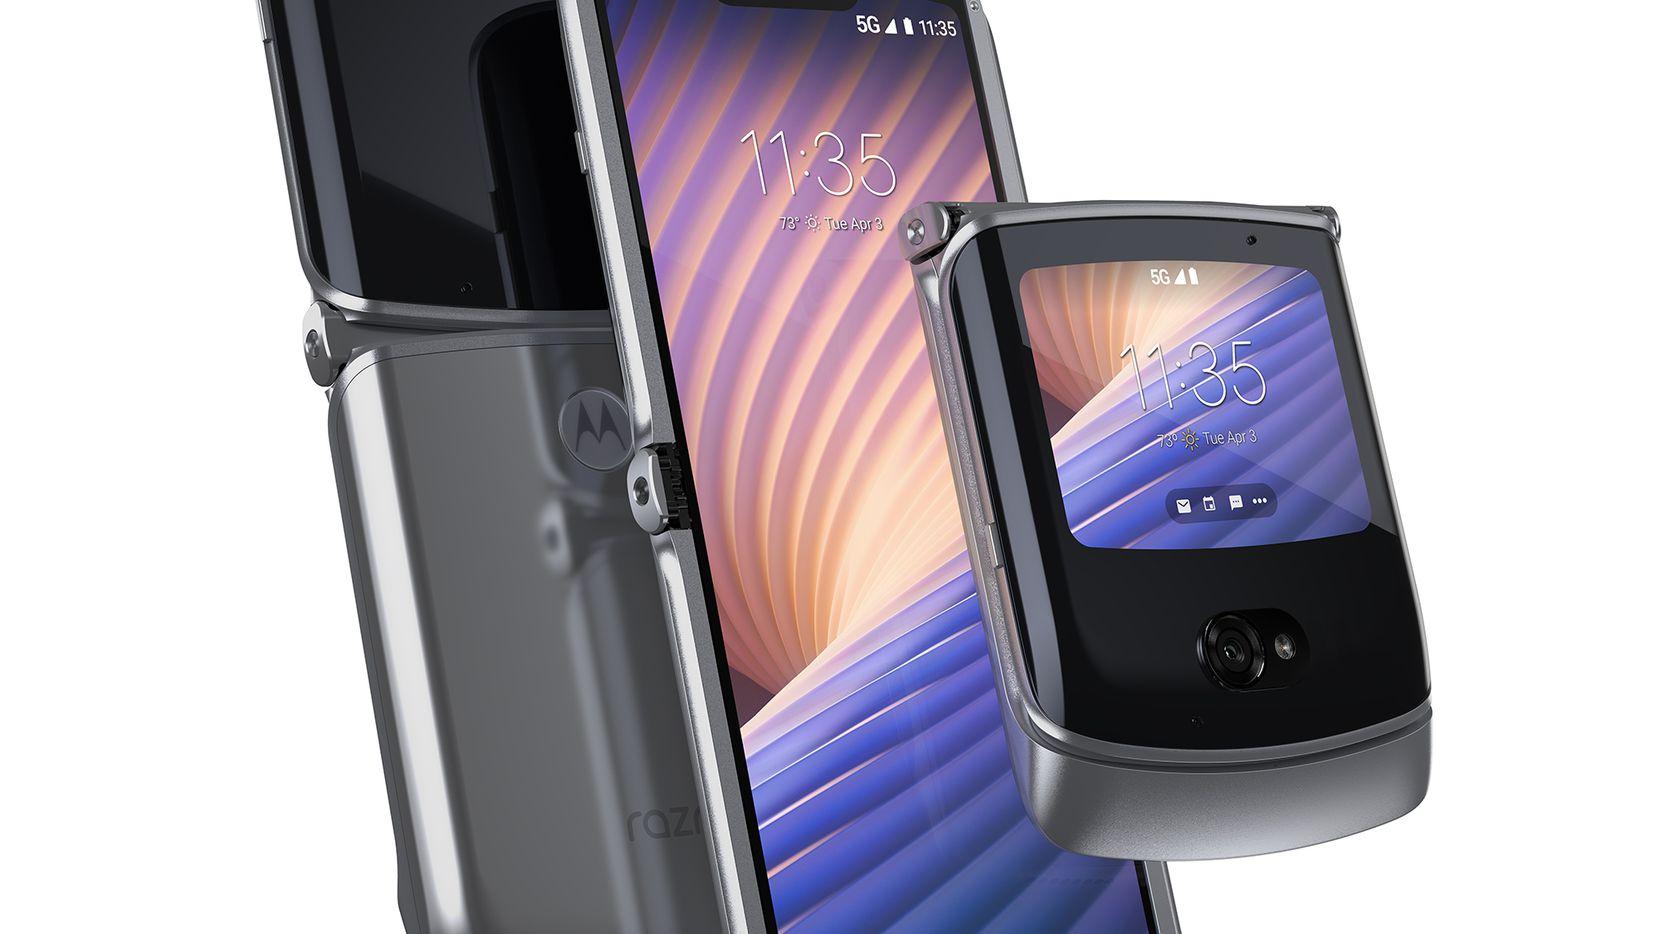 The Motorola Razr 5G